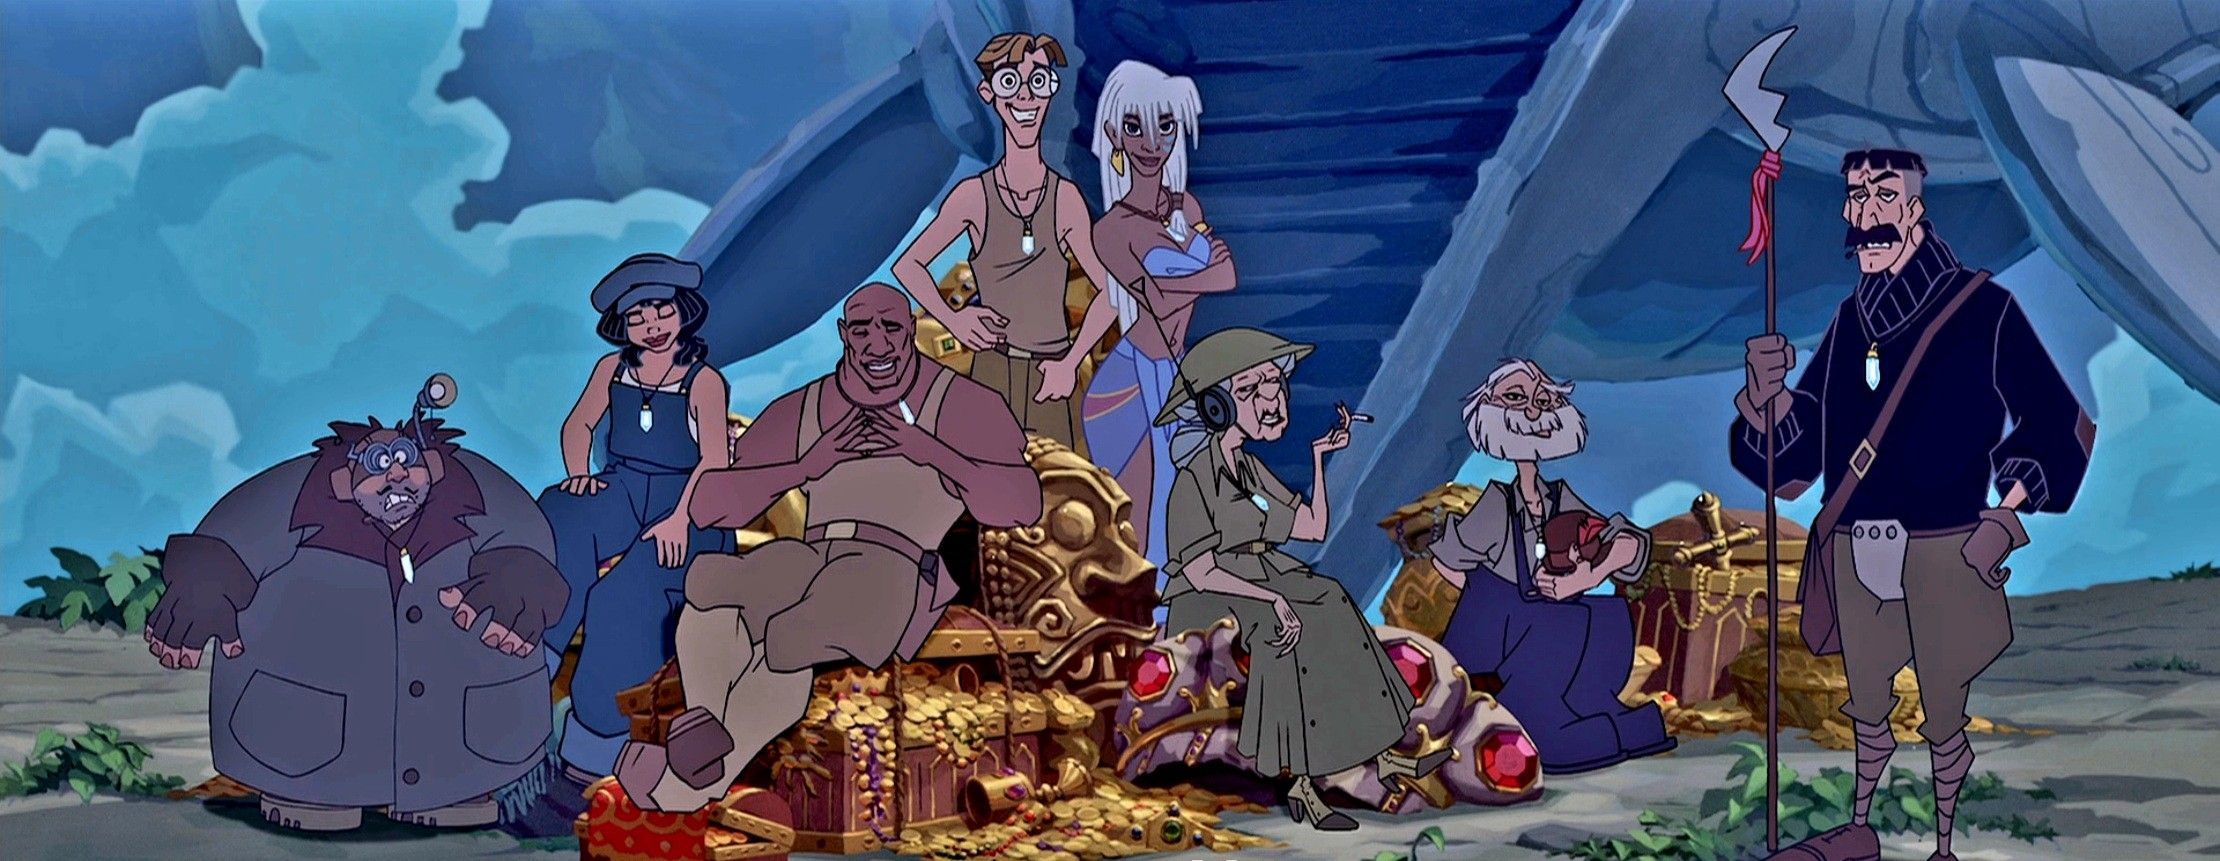 Epingle Par Bernard Fernandez Sur 1 Walt Disney En 2020